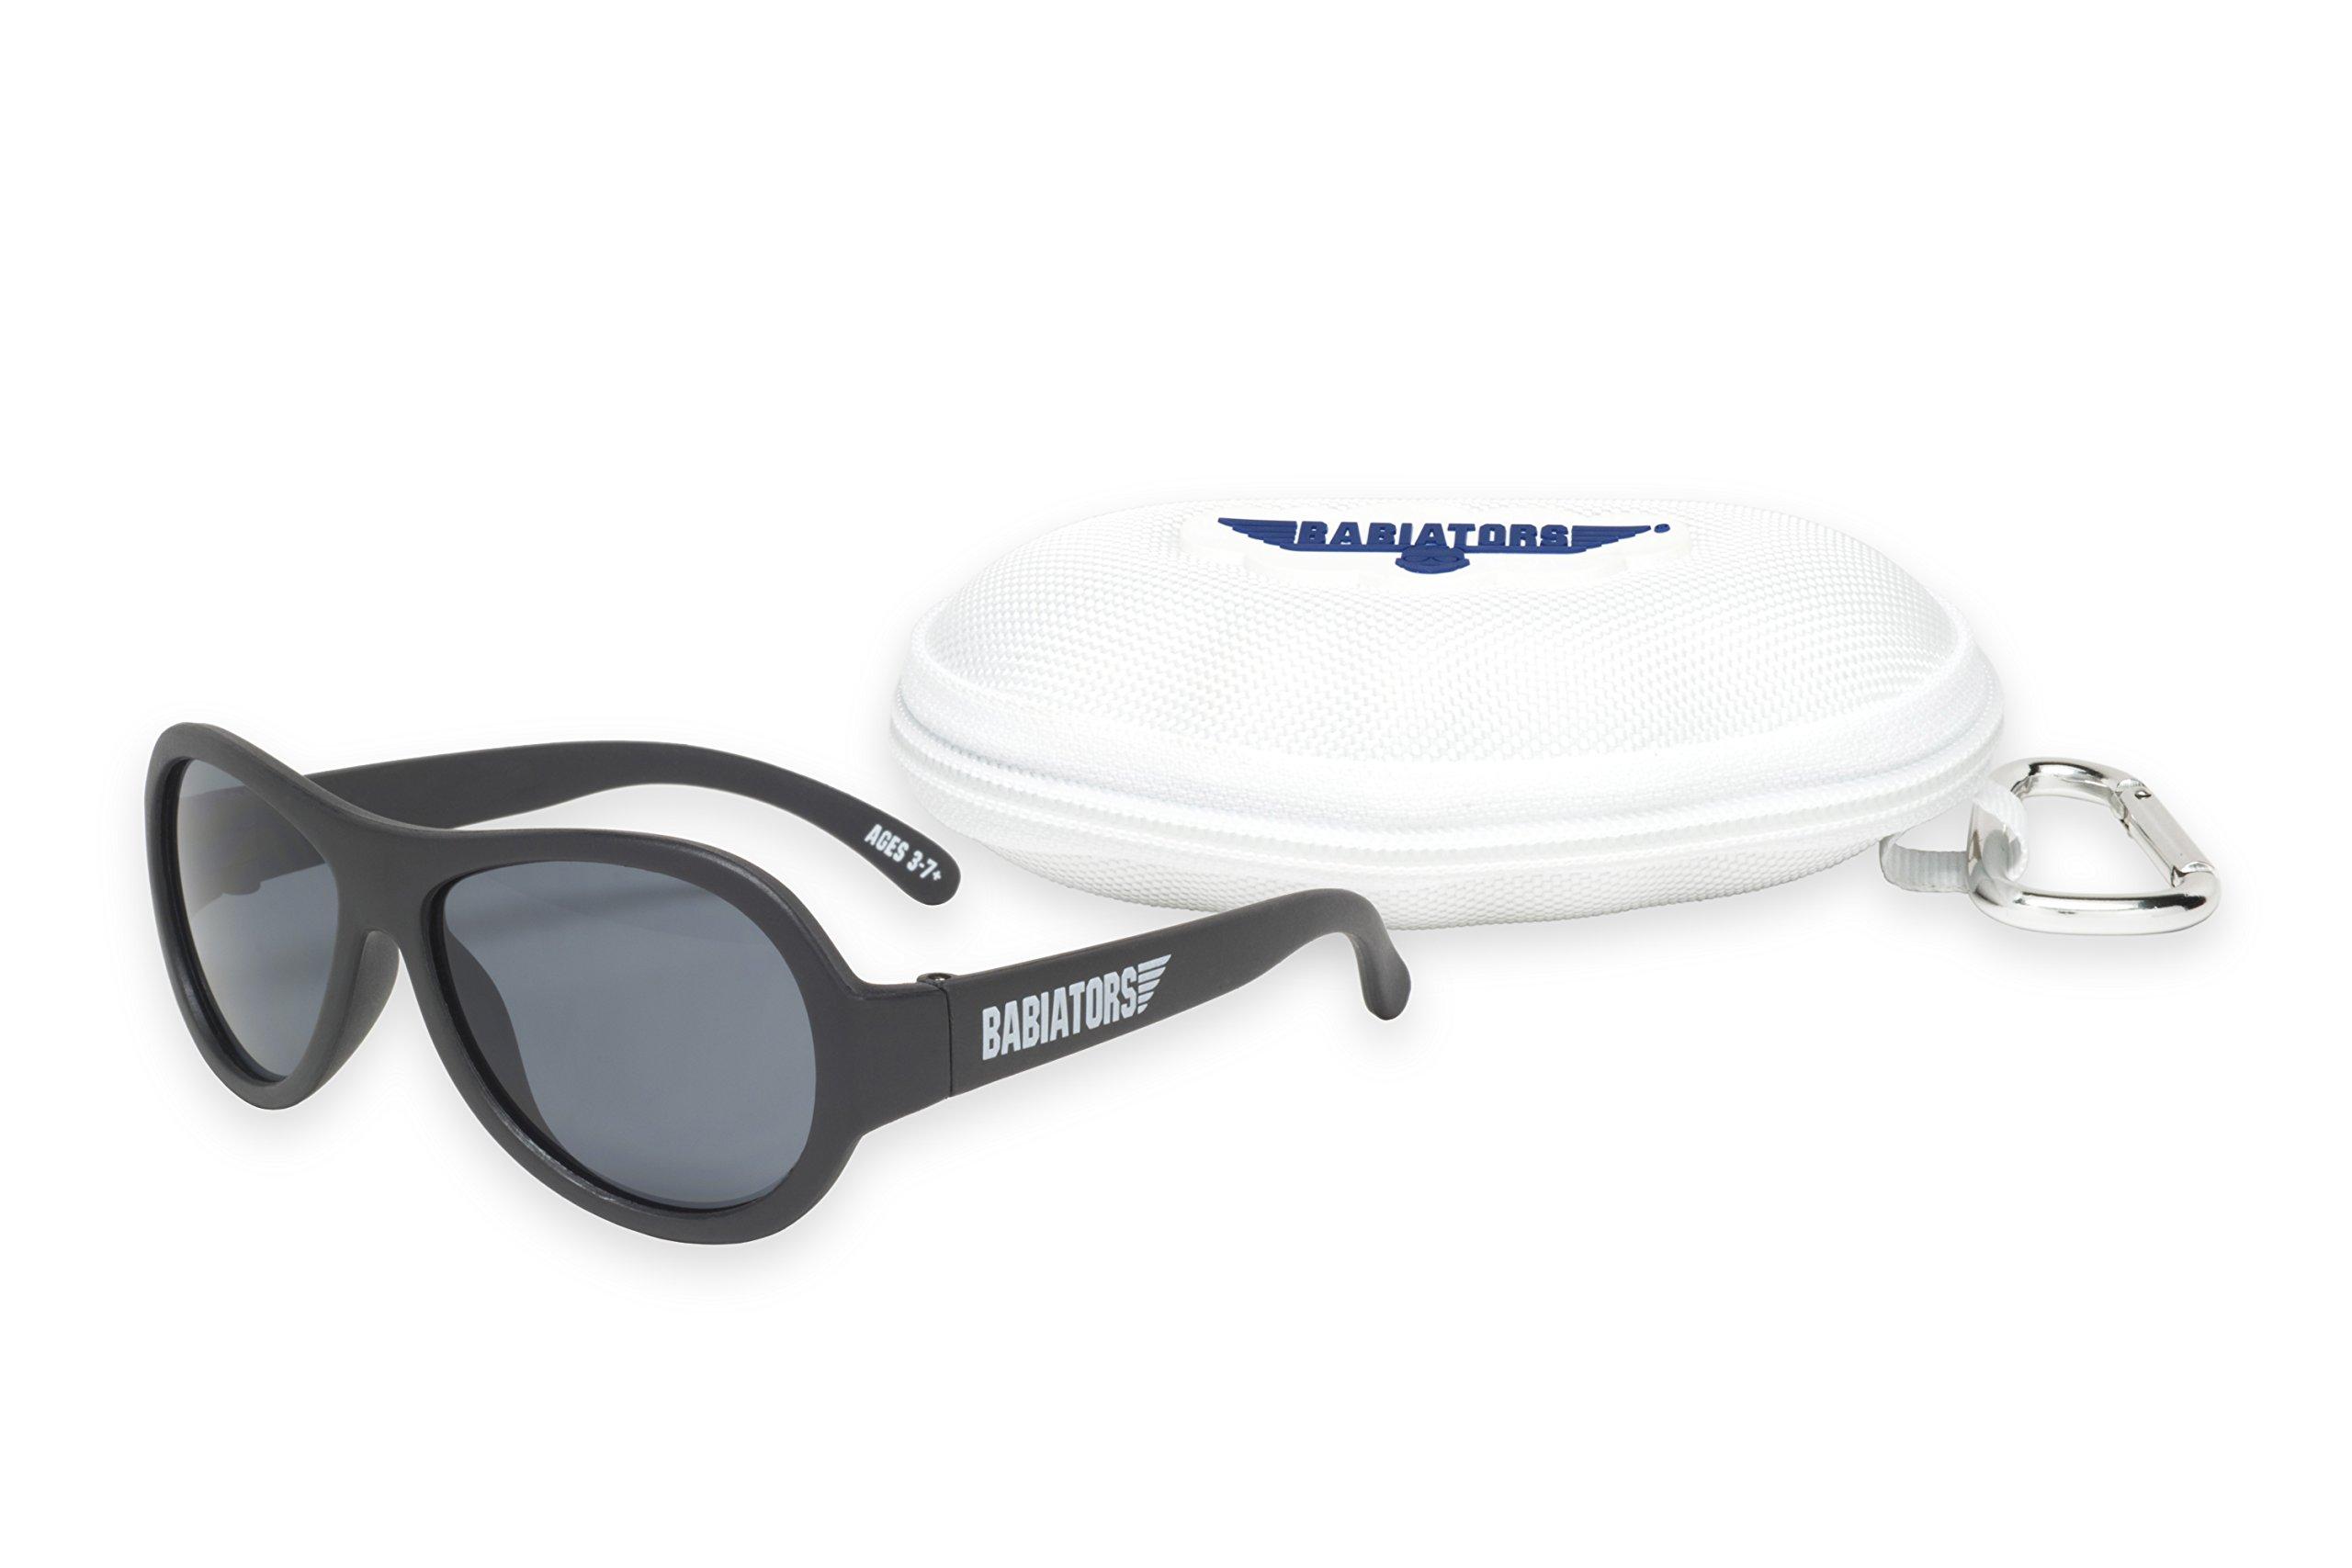 Babiators Gift Set - Black Ops Original Sunglasses (Ages 3-7+) and Cloud Case